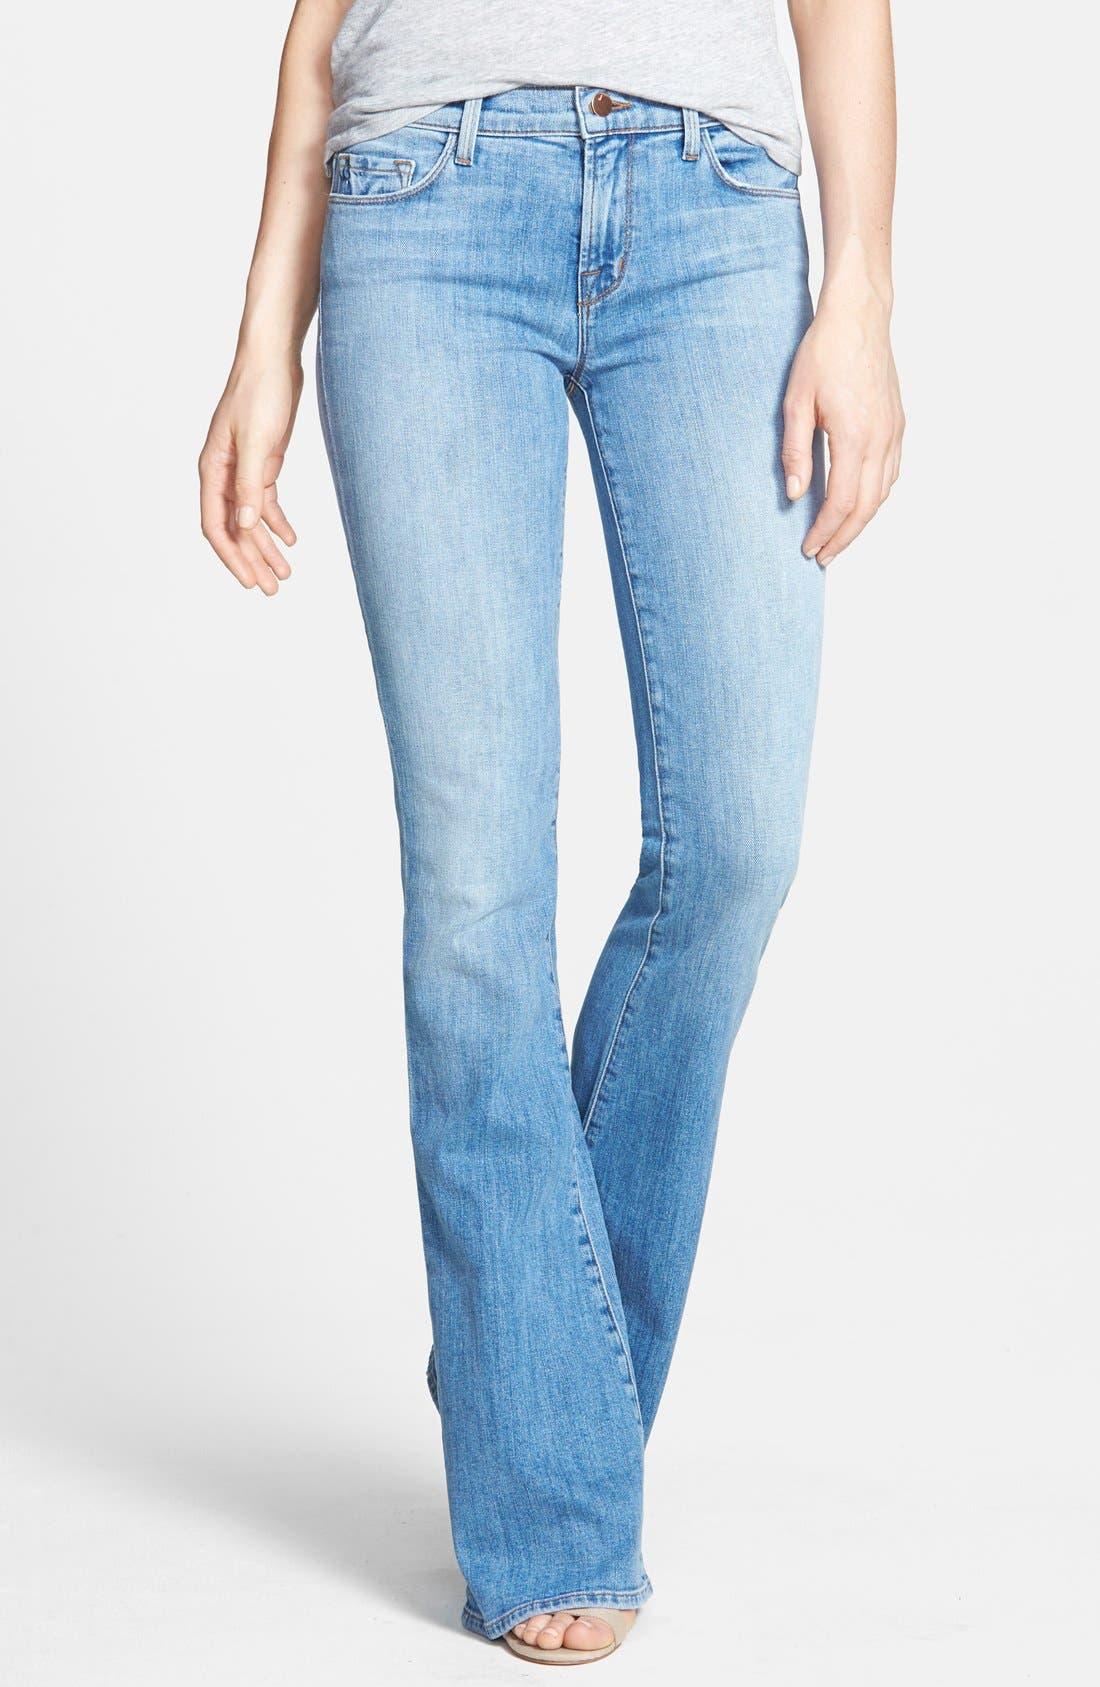 Main Image - J Brand 'Martini' Flared Jeans (Eternal)